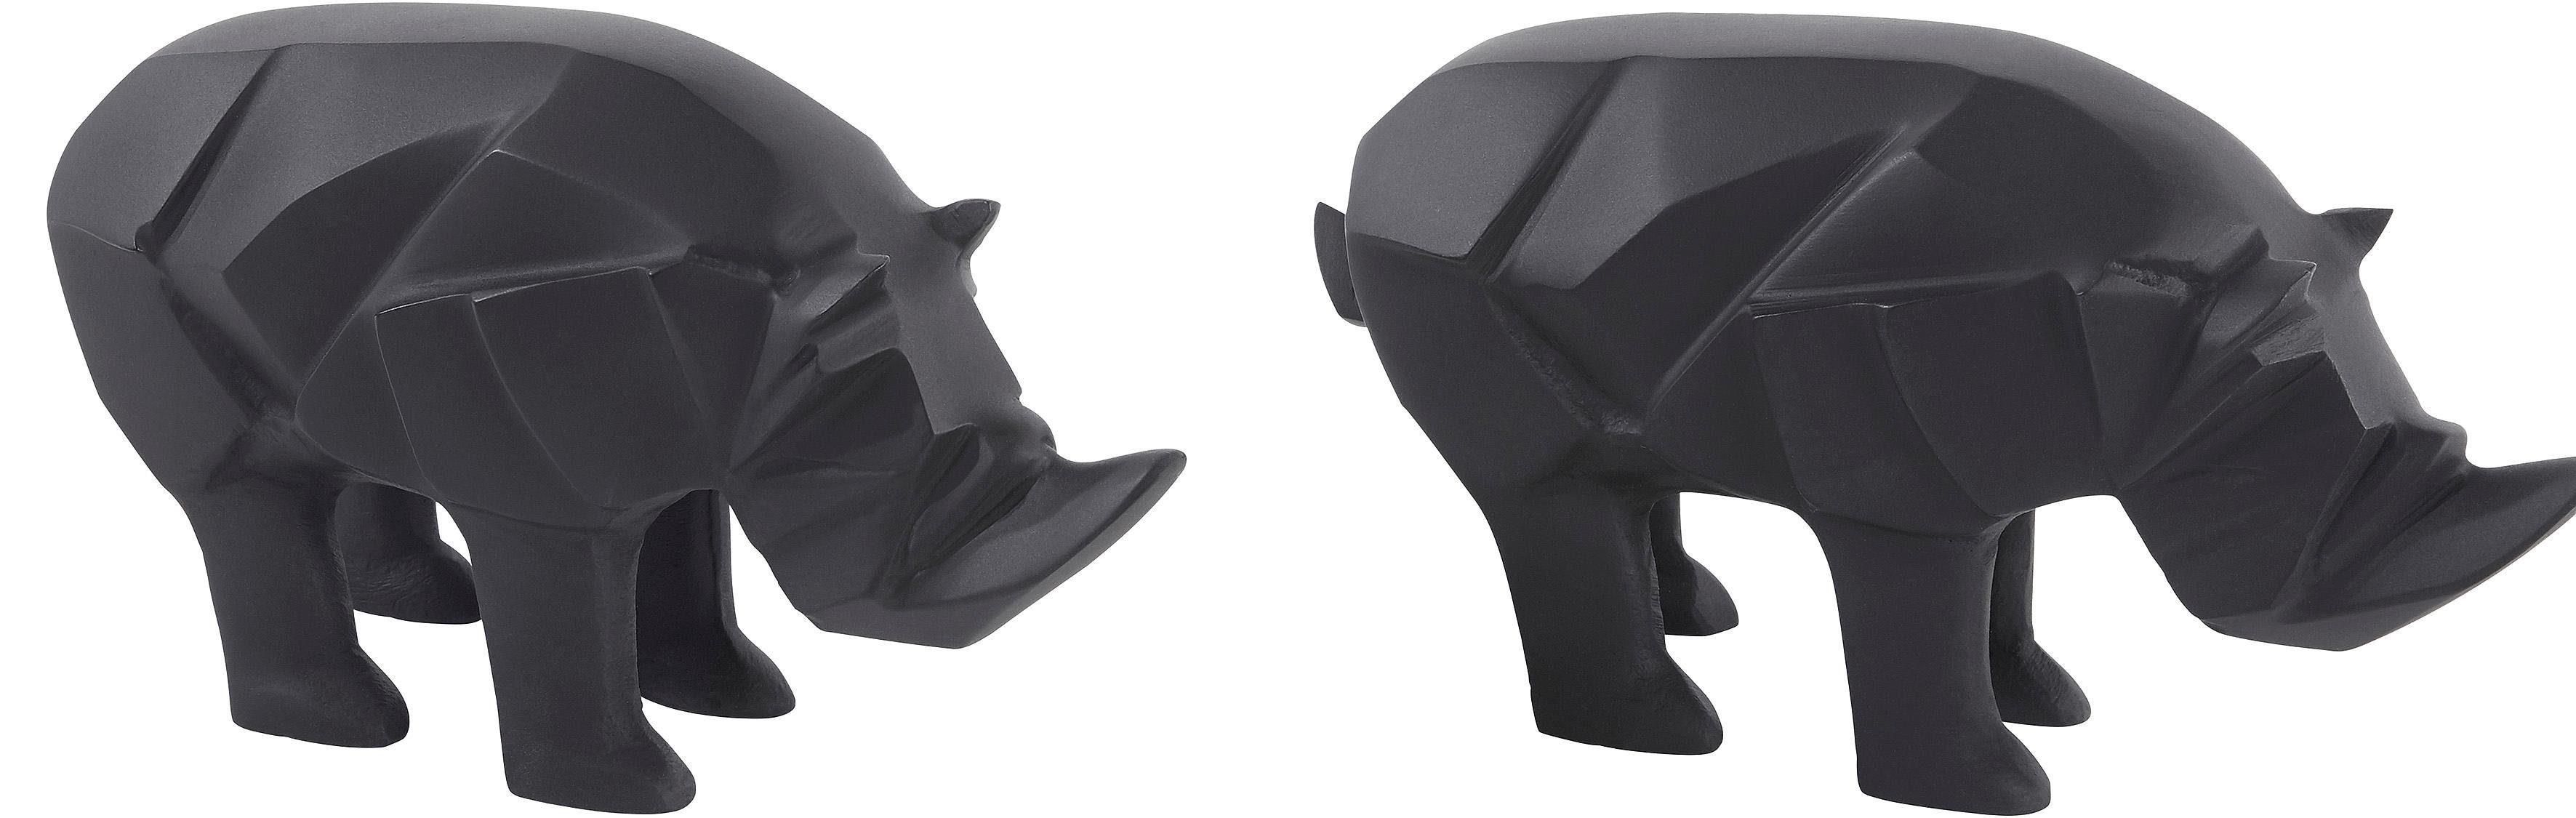 Lambert Deko-Figur »Rhino«